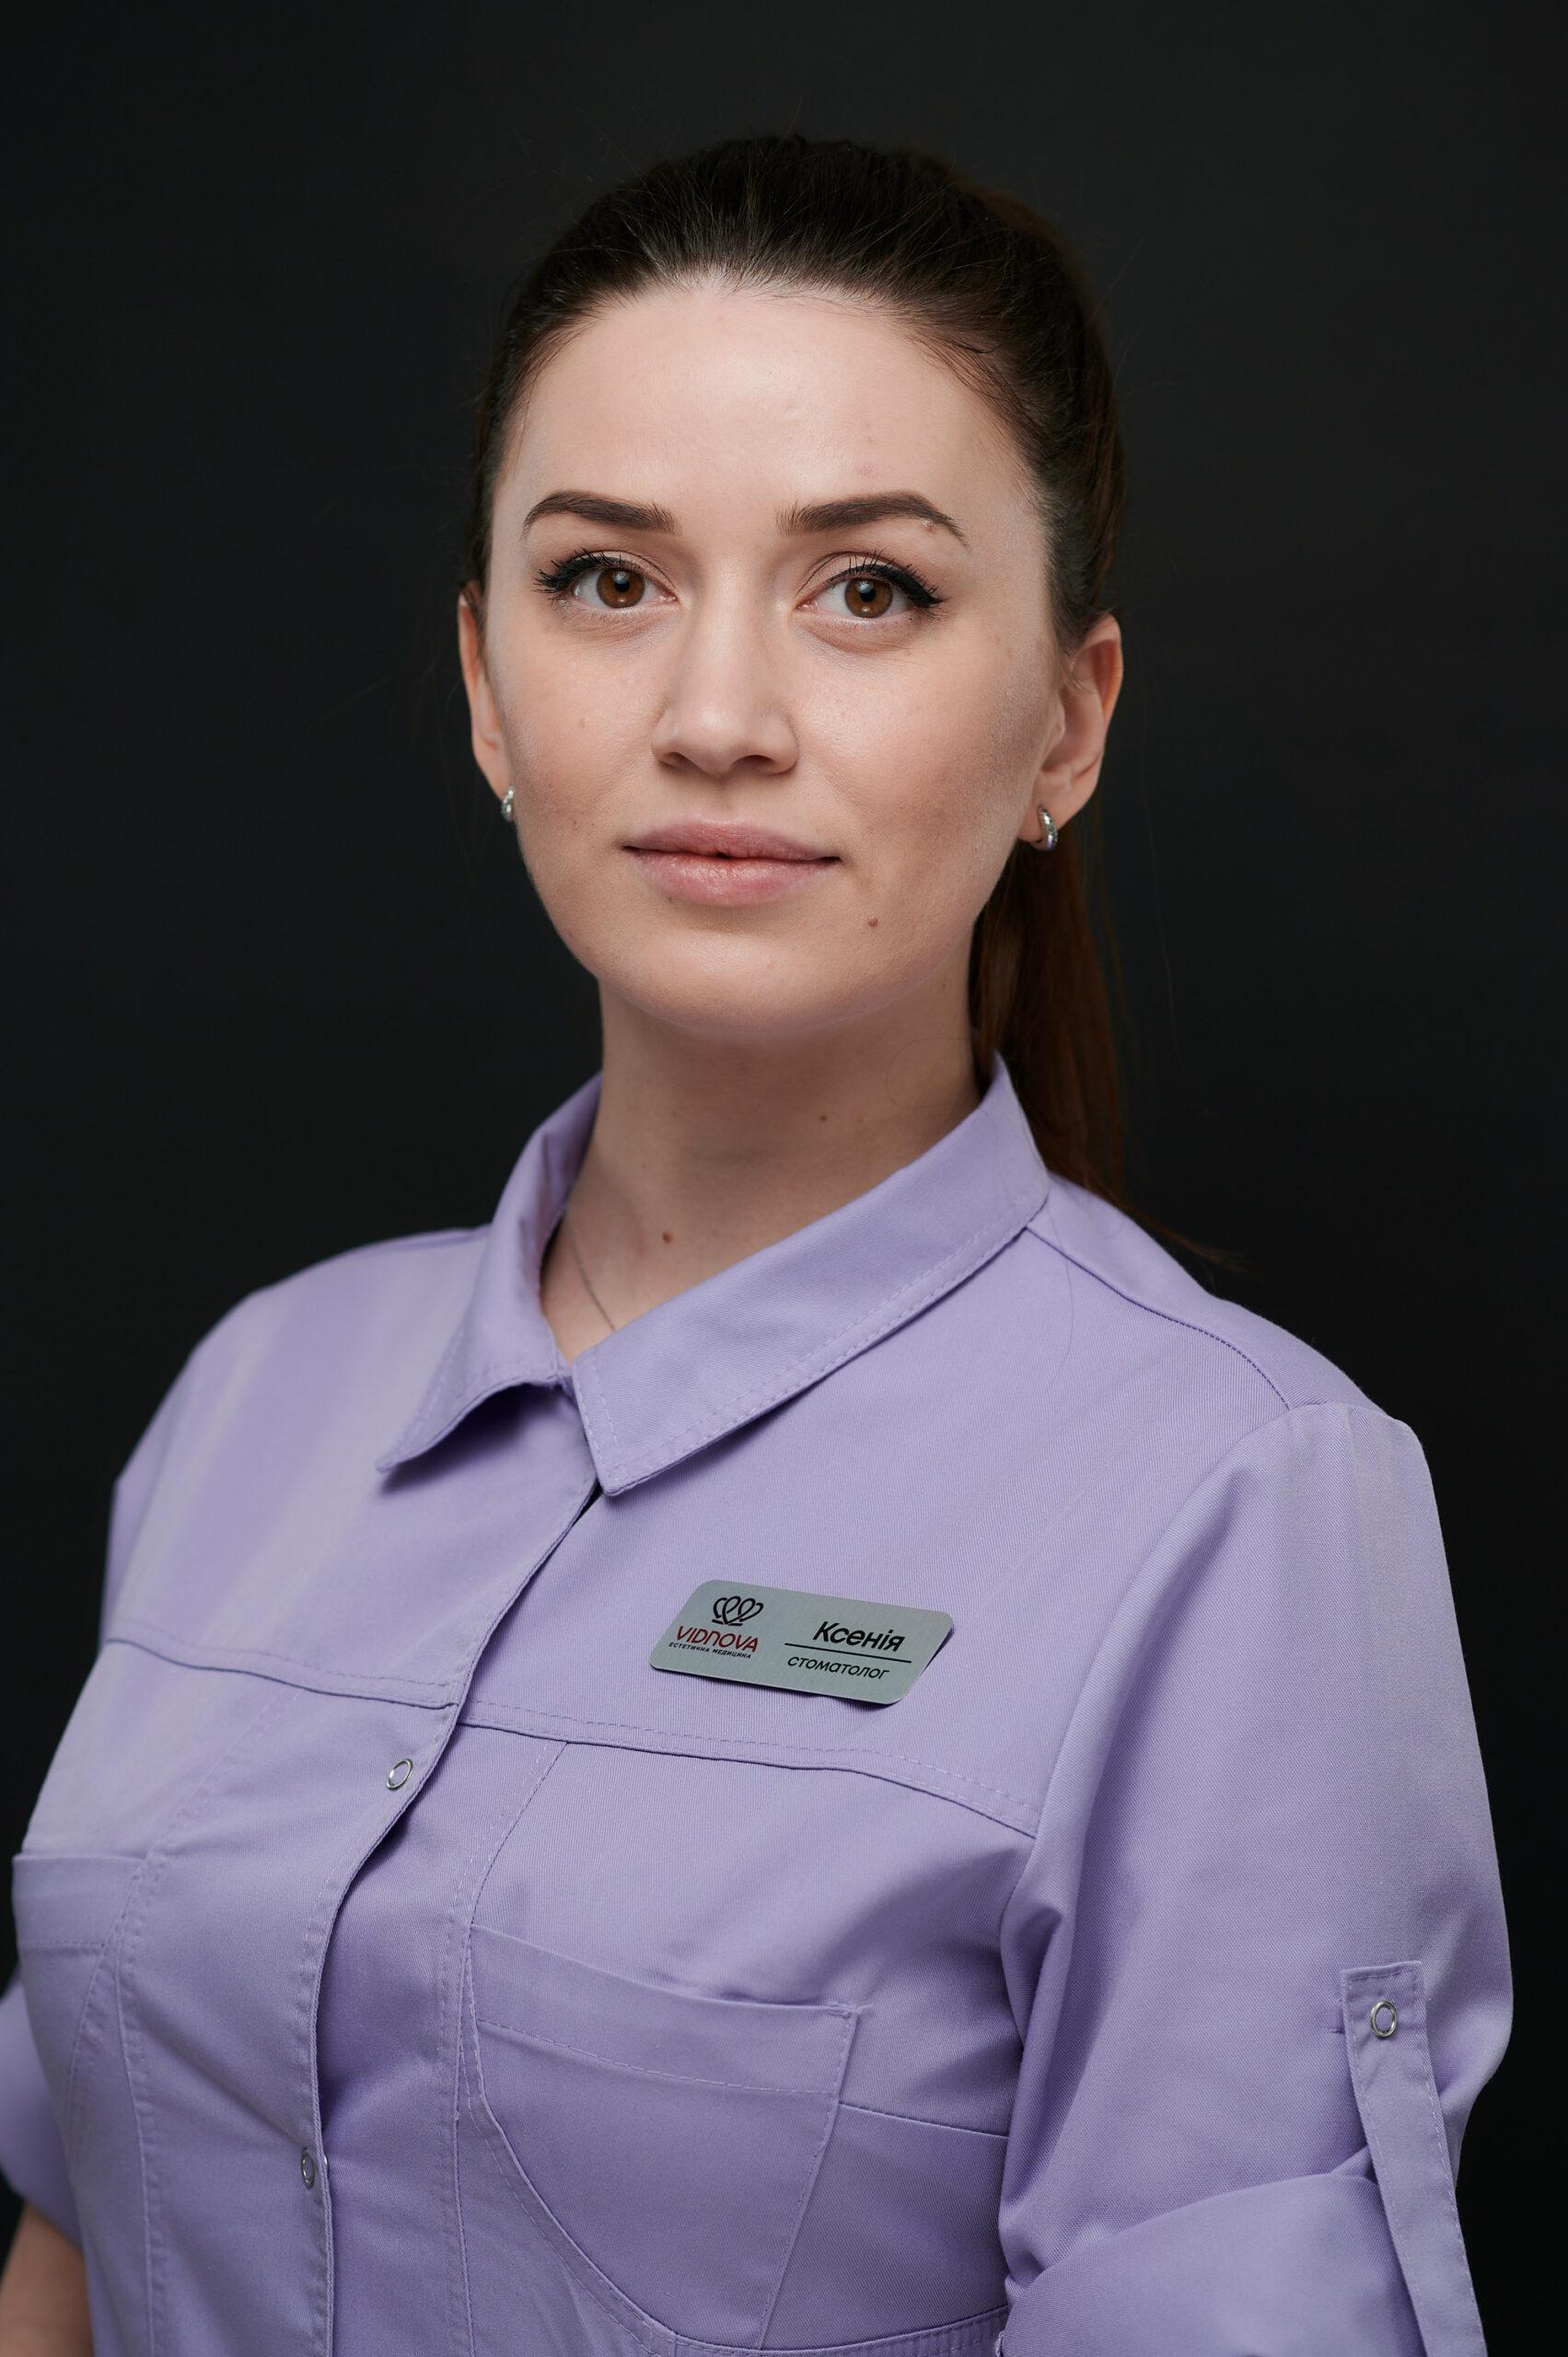 Шкор Ксения Алесандровна, детский стоматолог клиники Vidnova